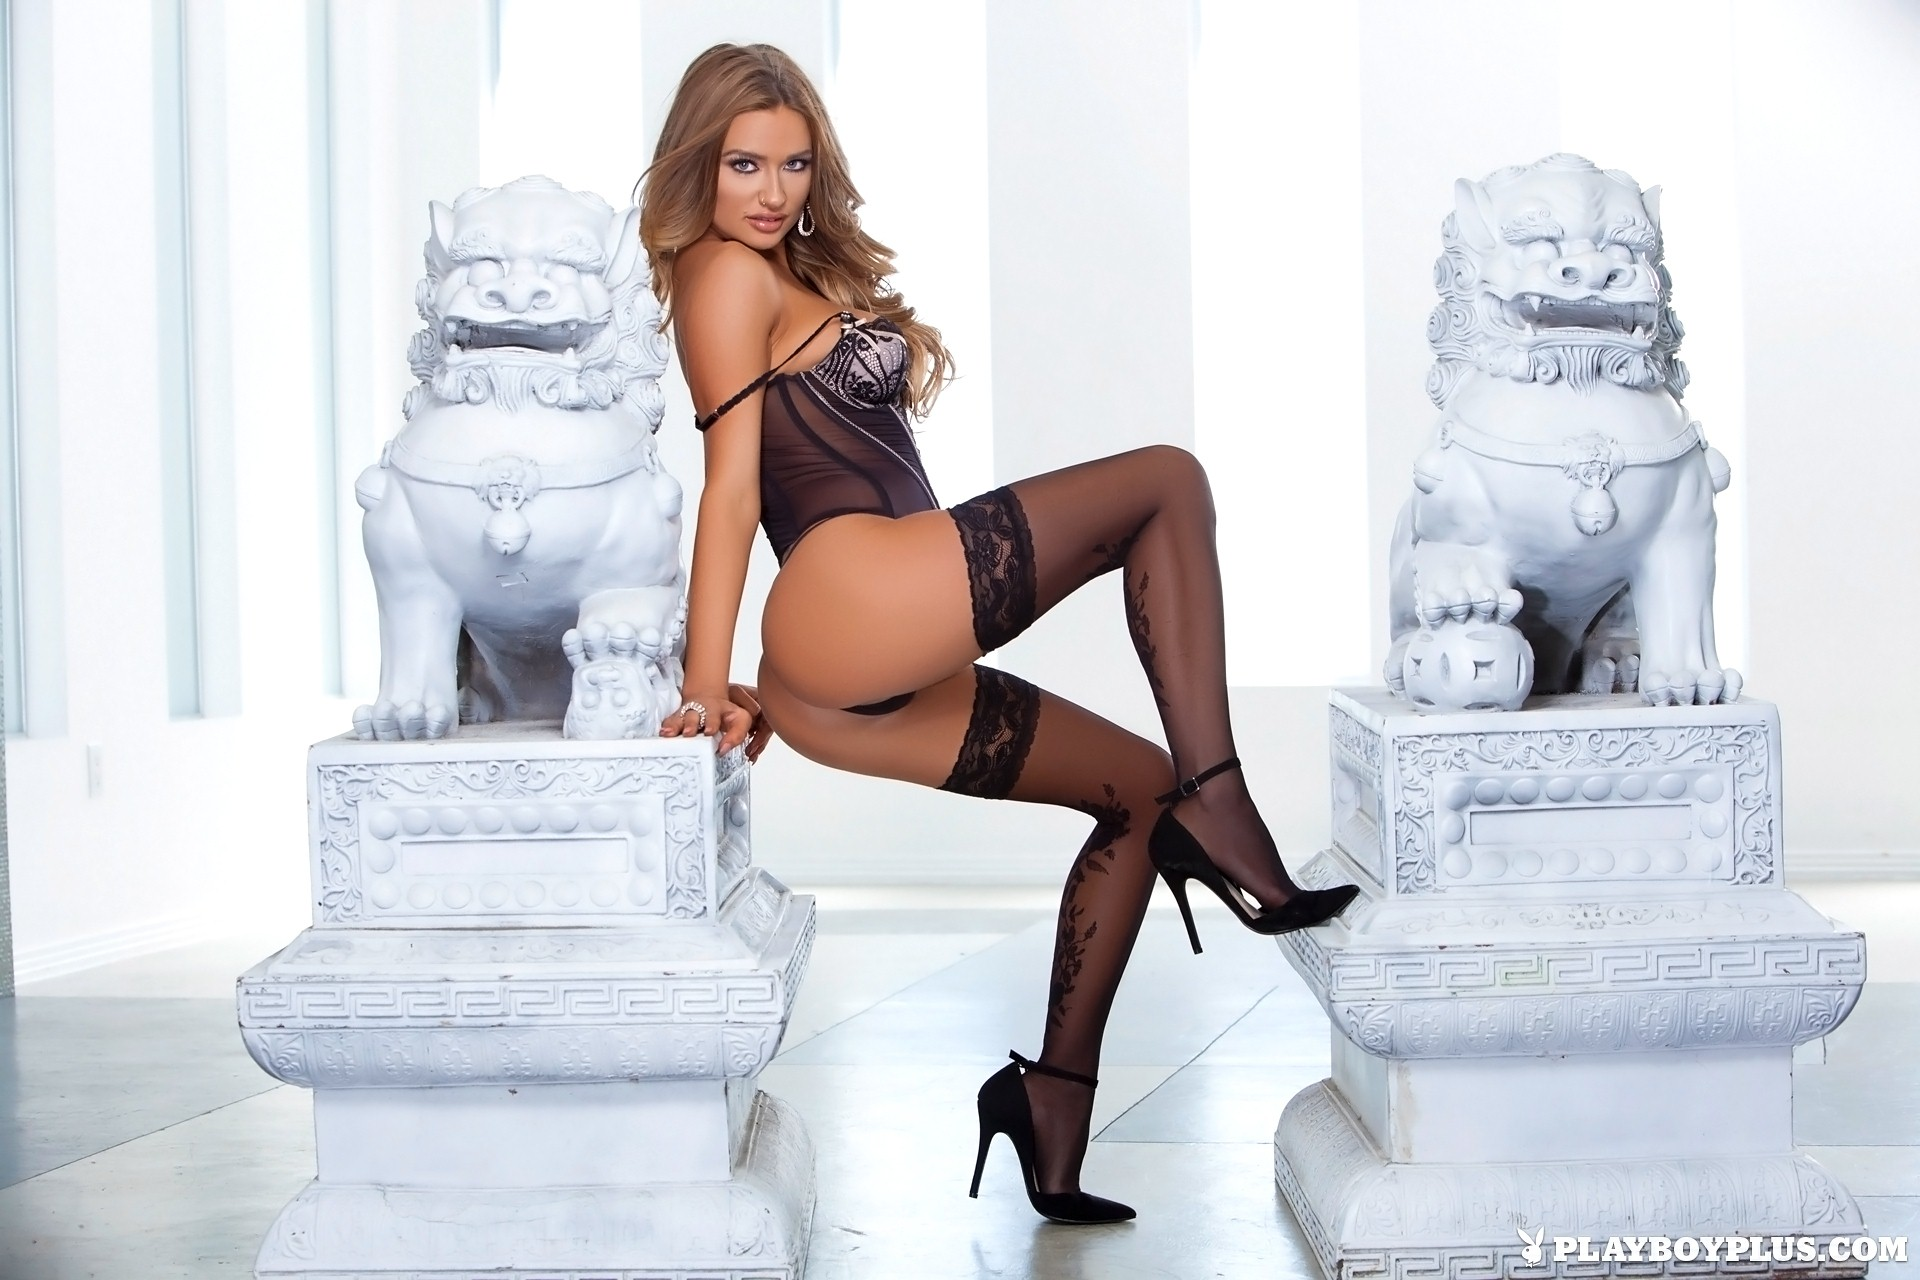 Brittney Shumaker in Sensual Interlude for Playboy | Daily Girls @ Female Update